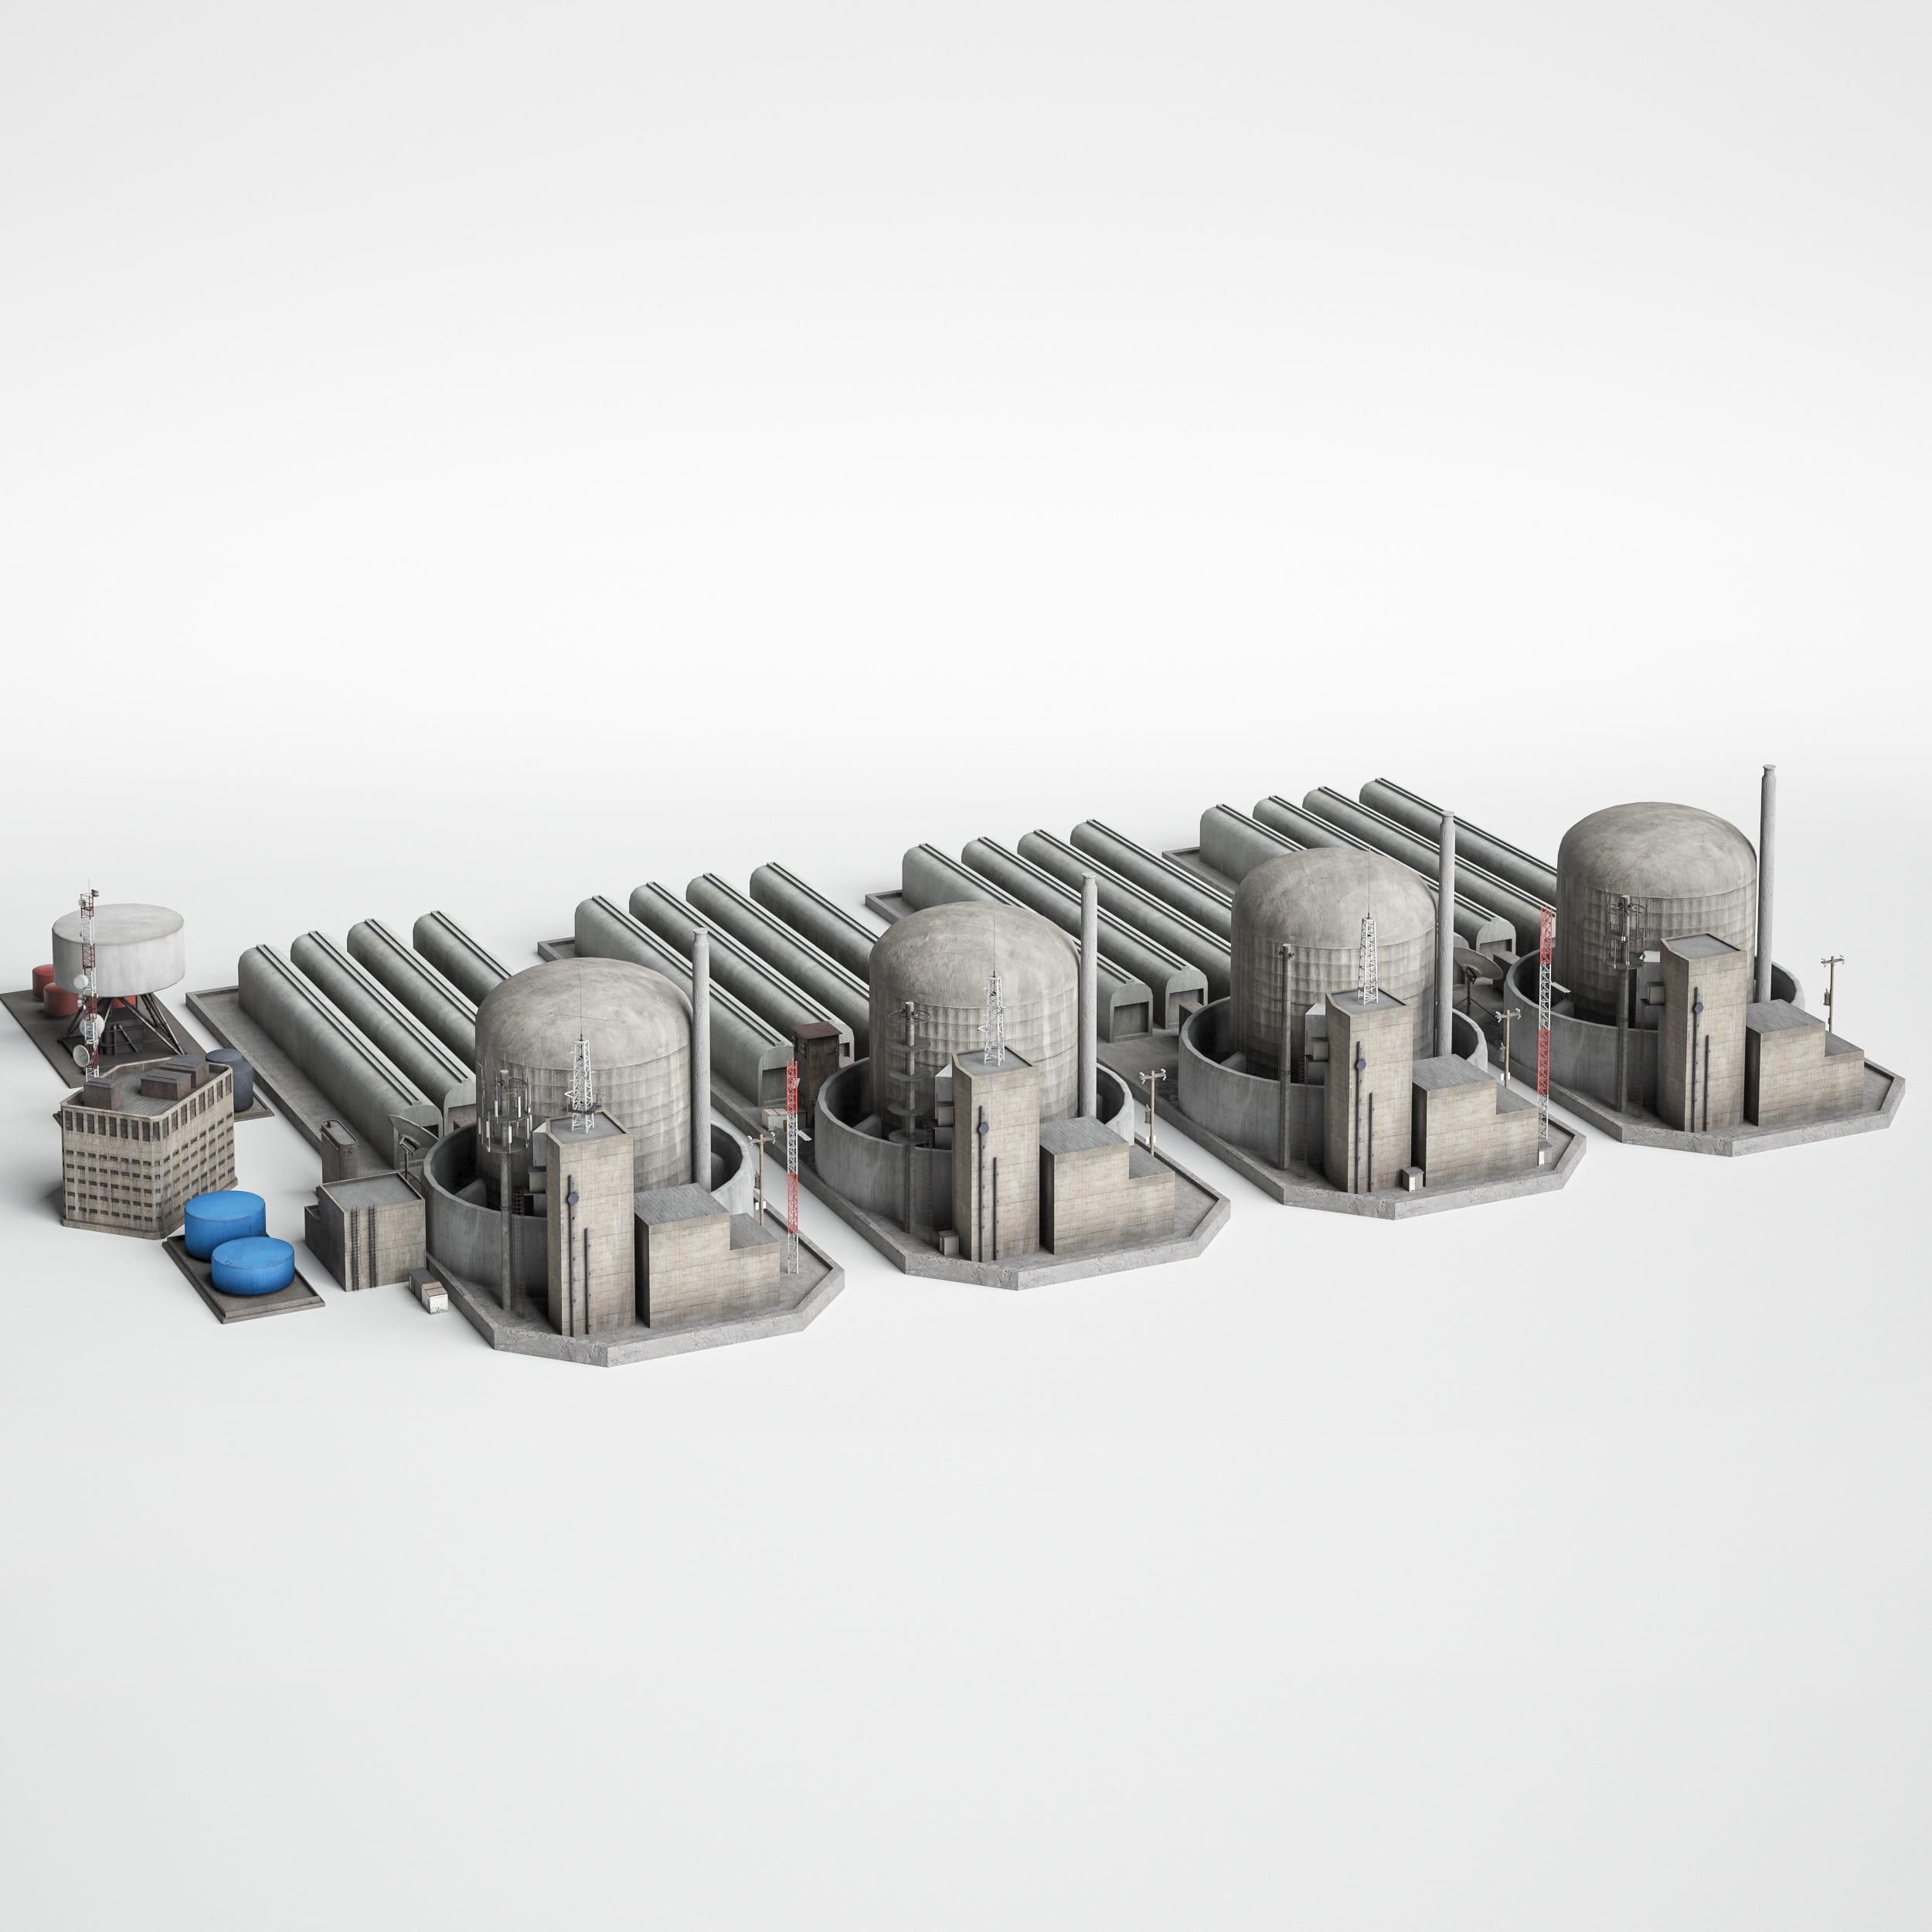 power station 17 AM227 Archmodels